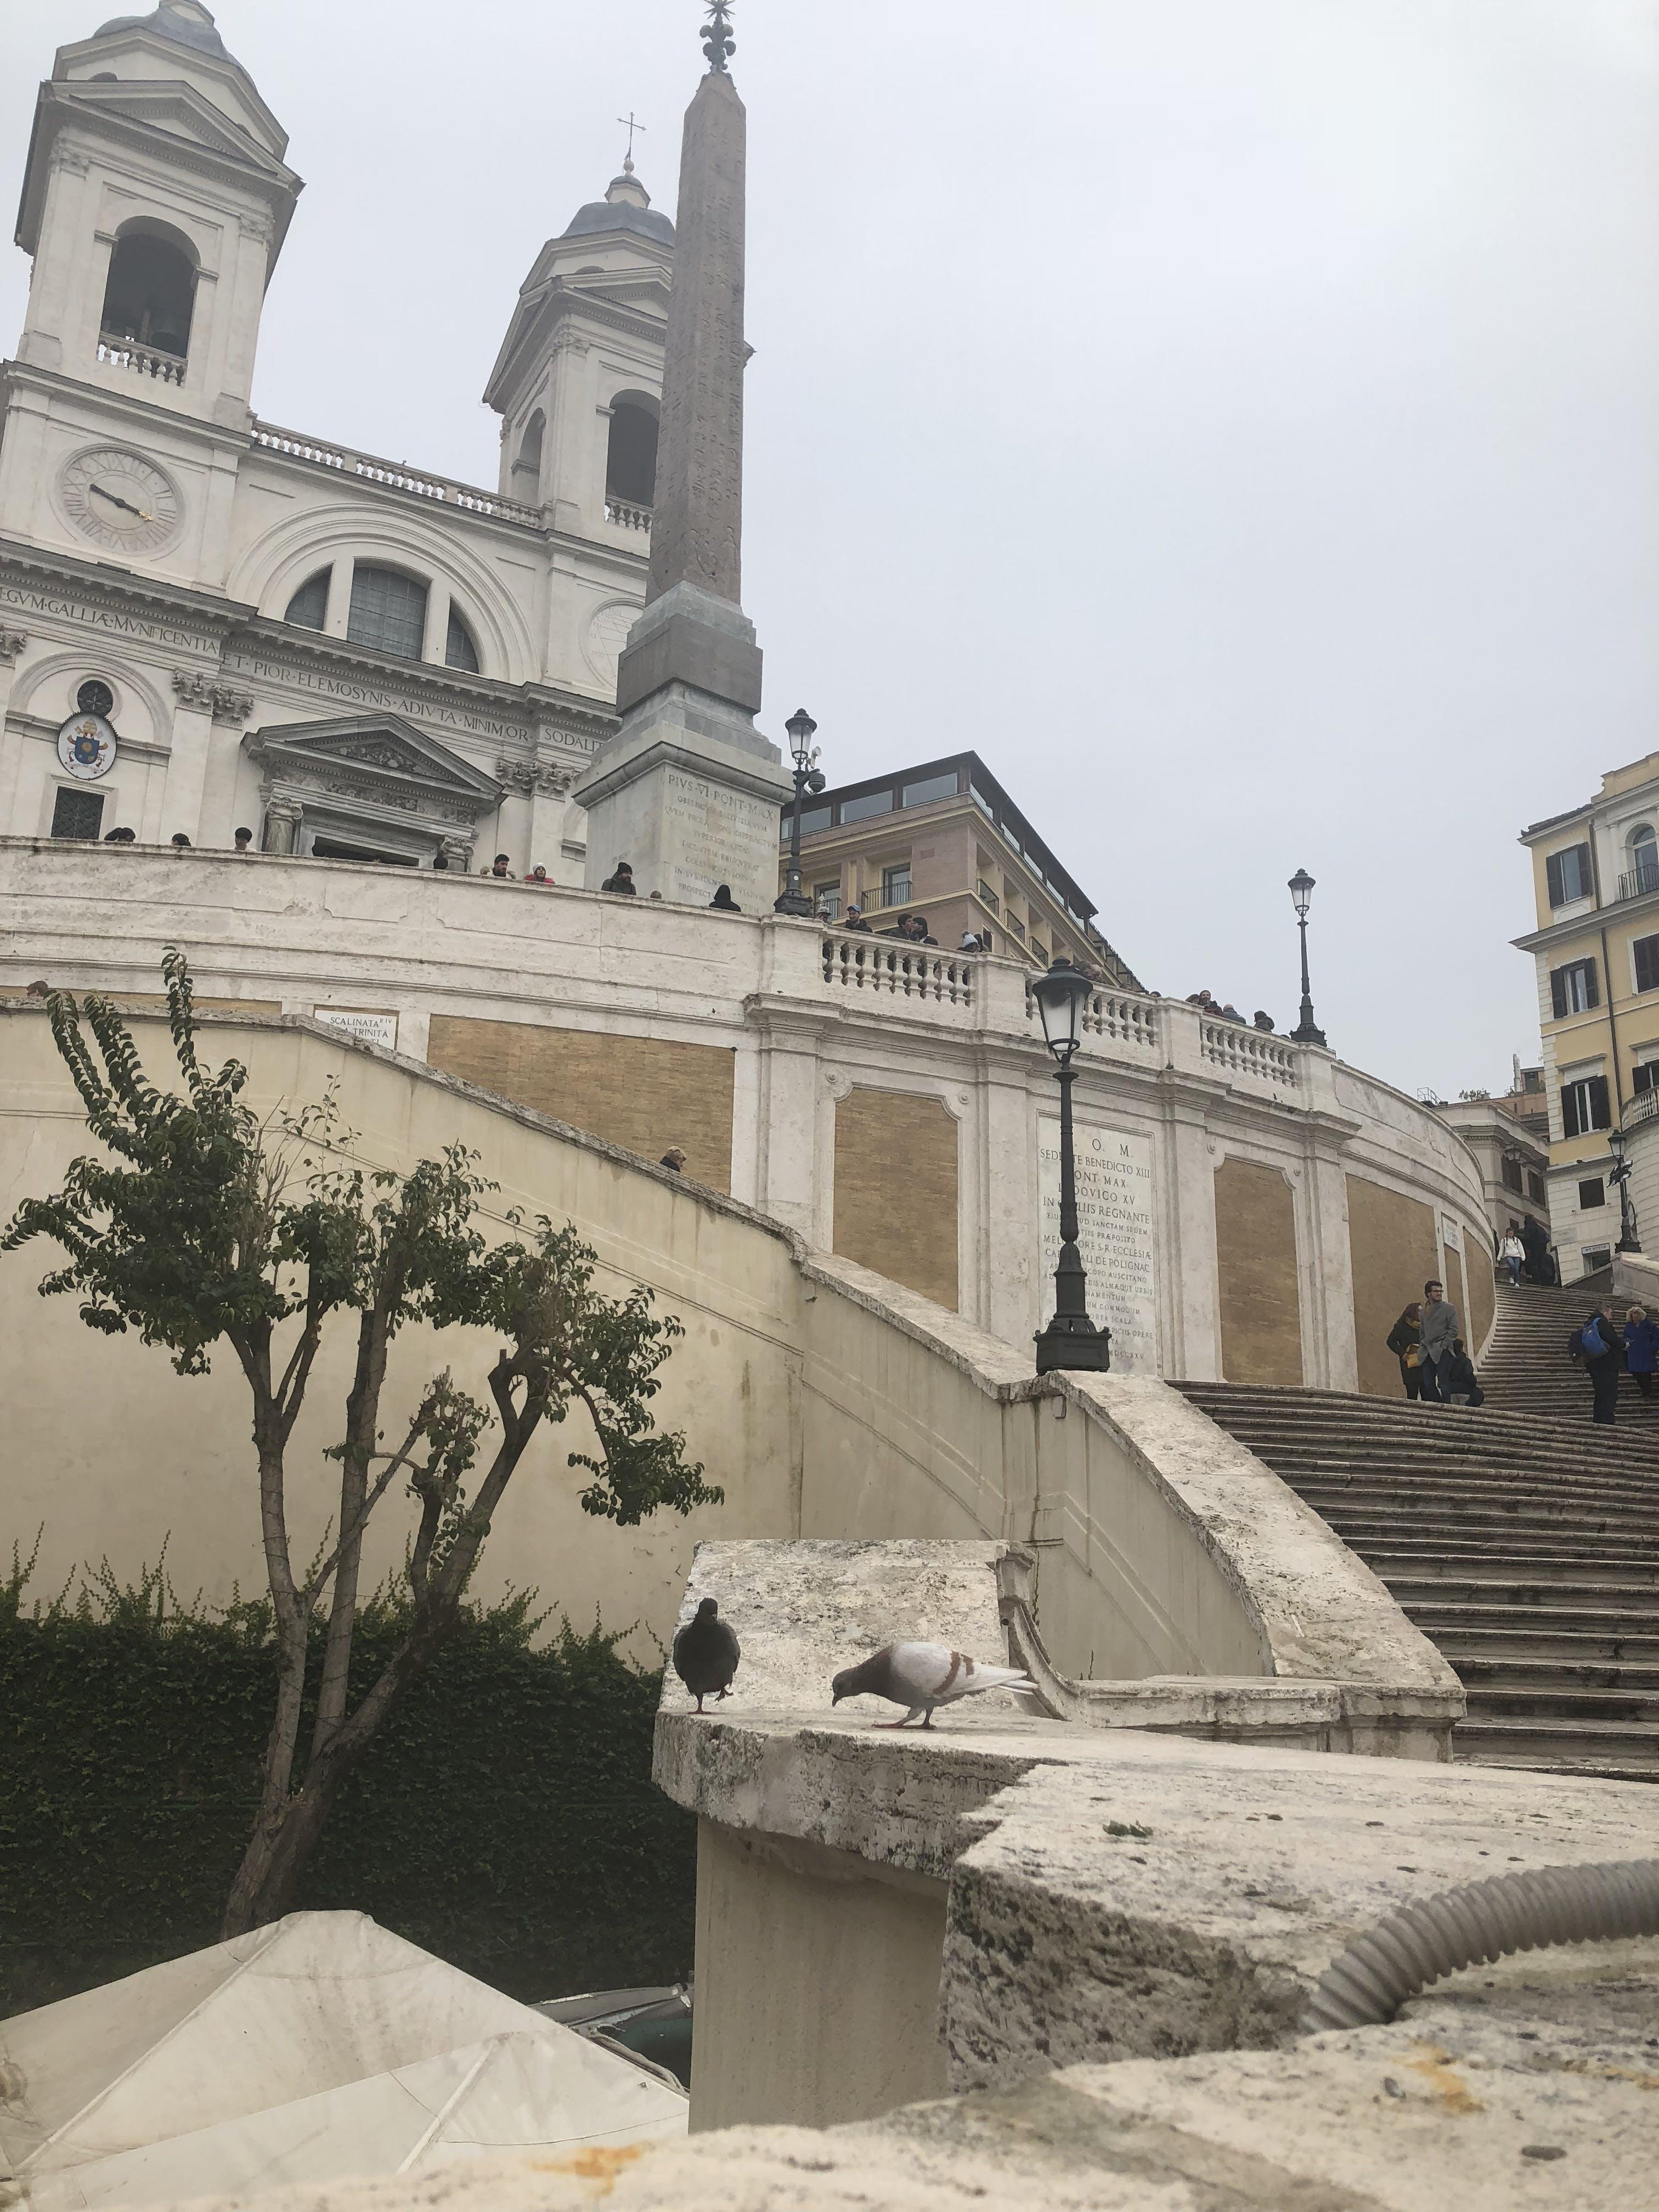 Fotos de stock gratuitas de Italia, mobilechallenge, pasos en español, Roma